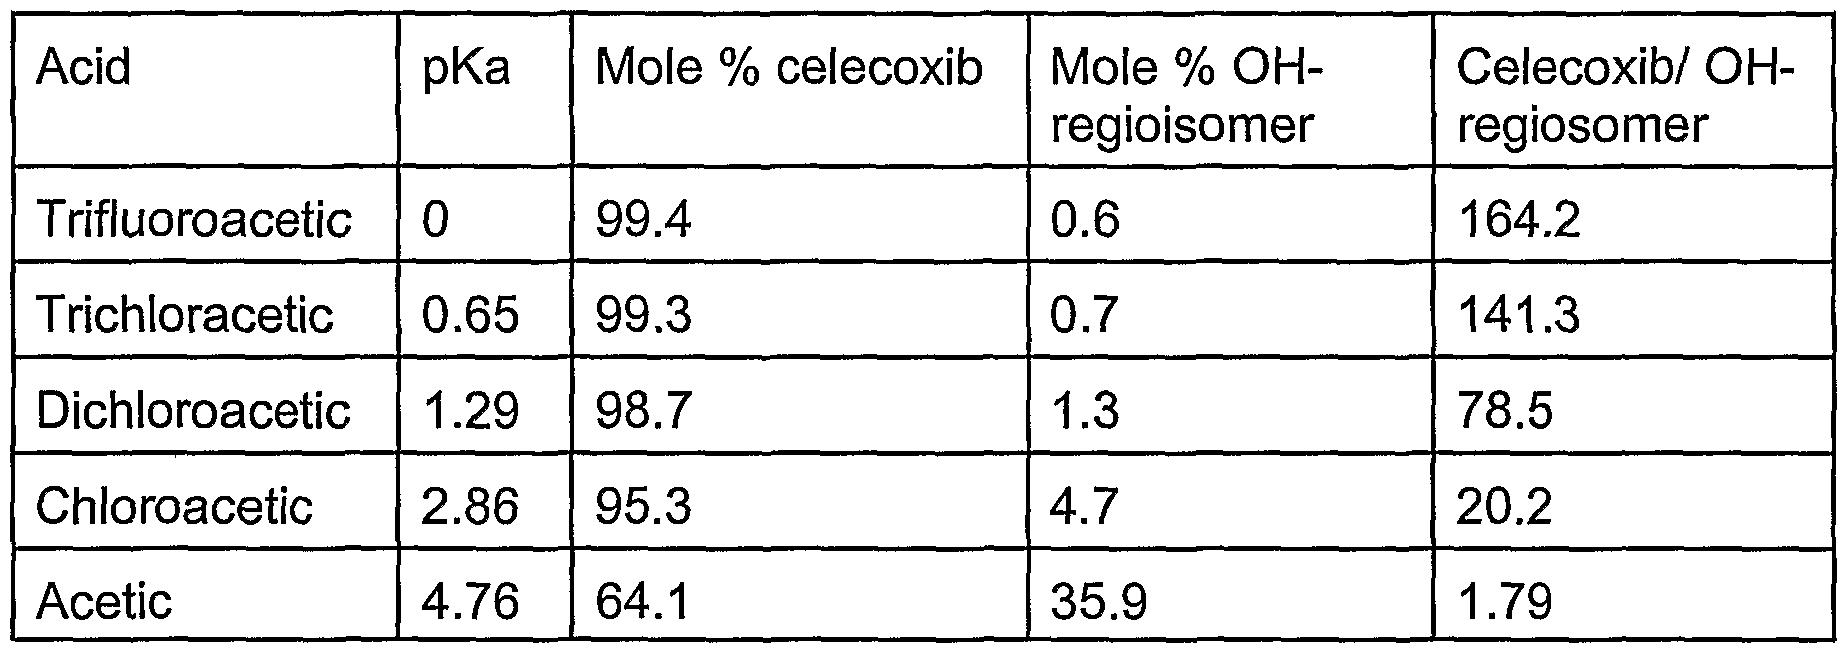 prednisone and hives